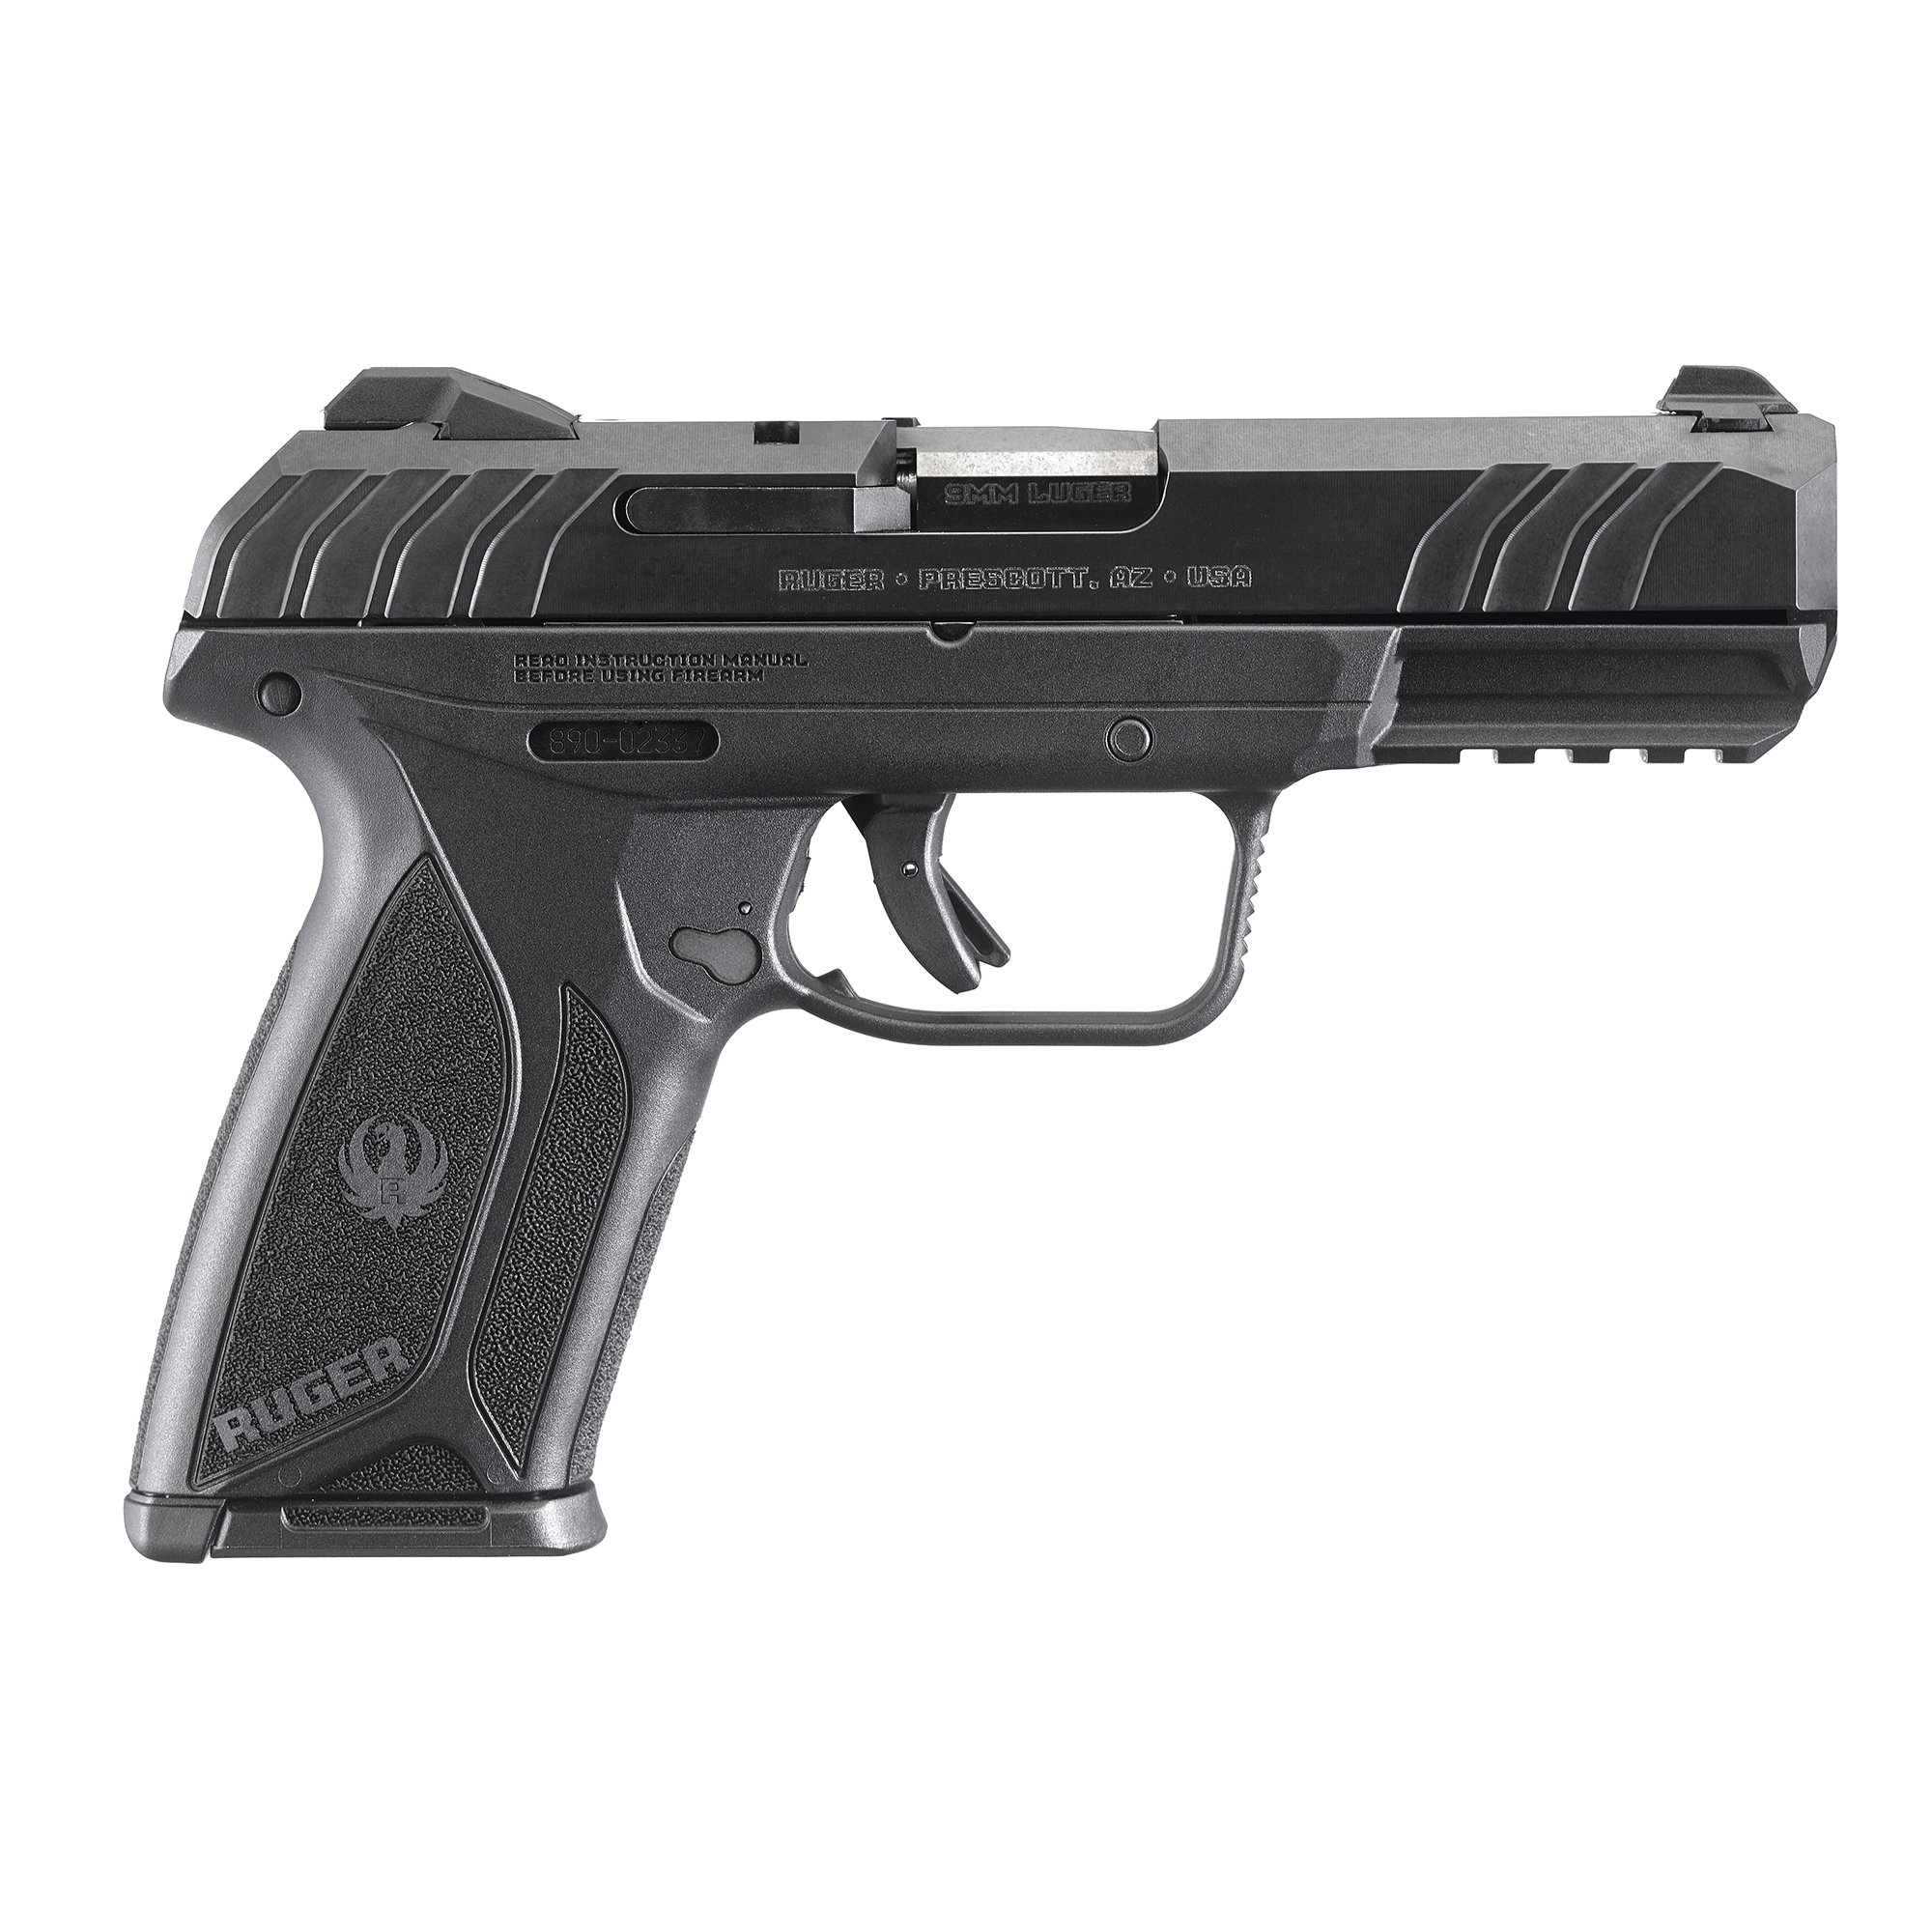 Ruger Security-9 Handgun, 15 Rd.